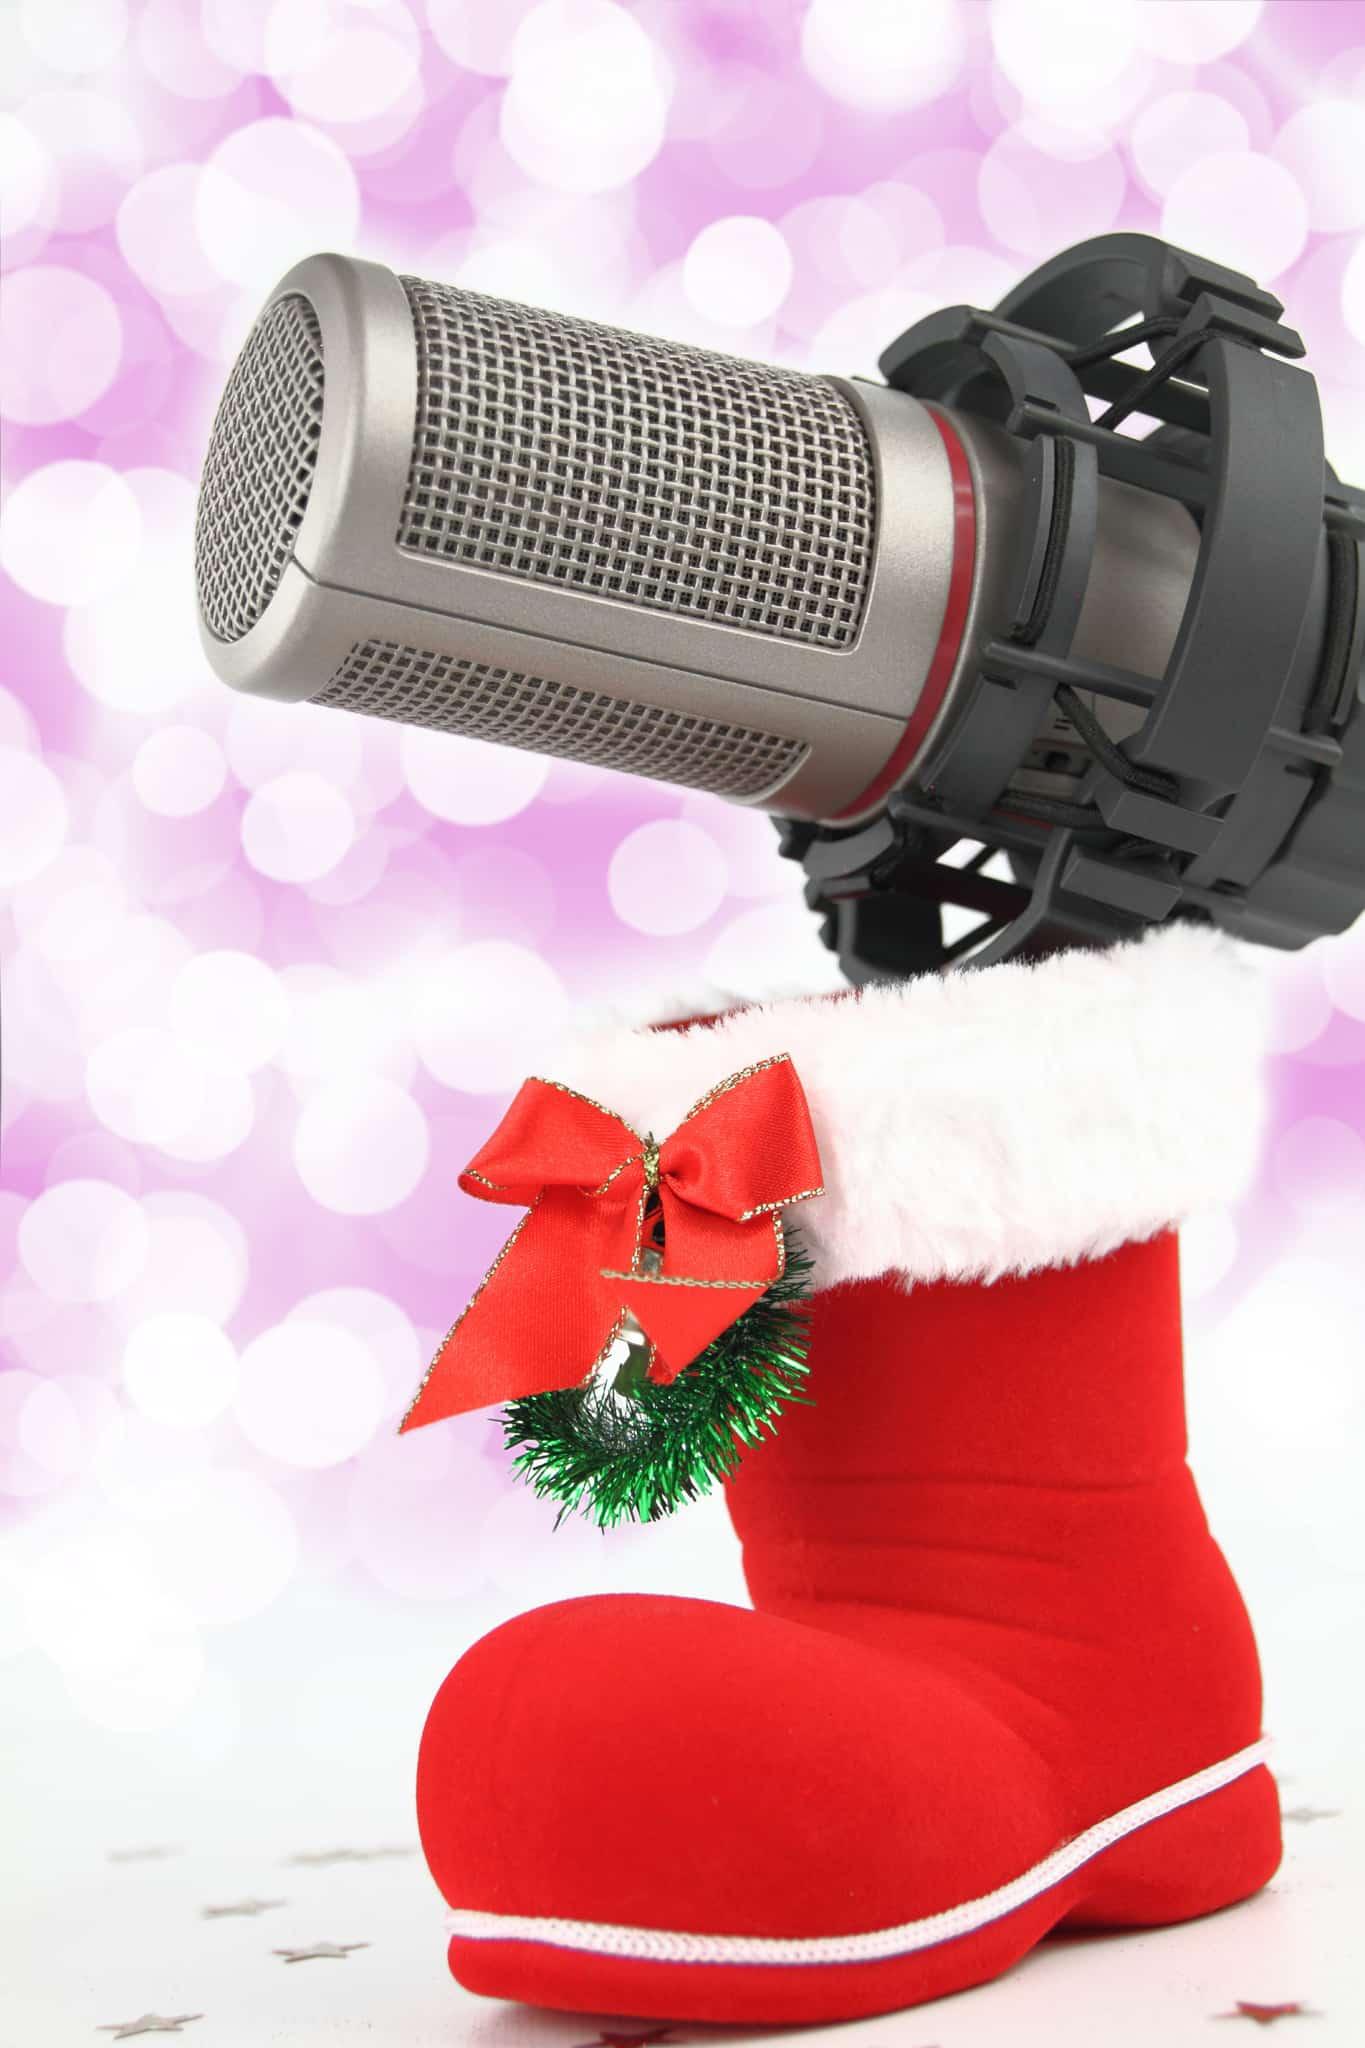 Free Radio Jingles] Merry Christmas